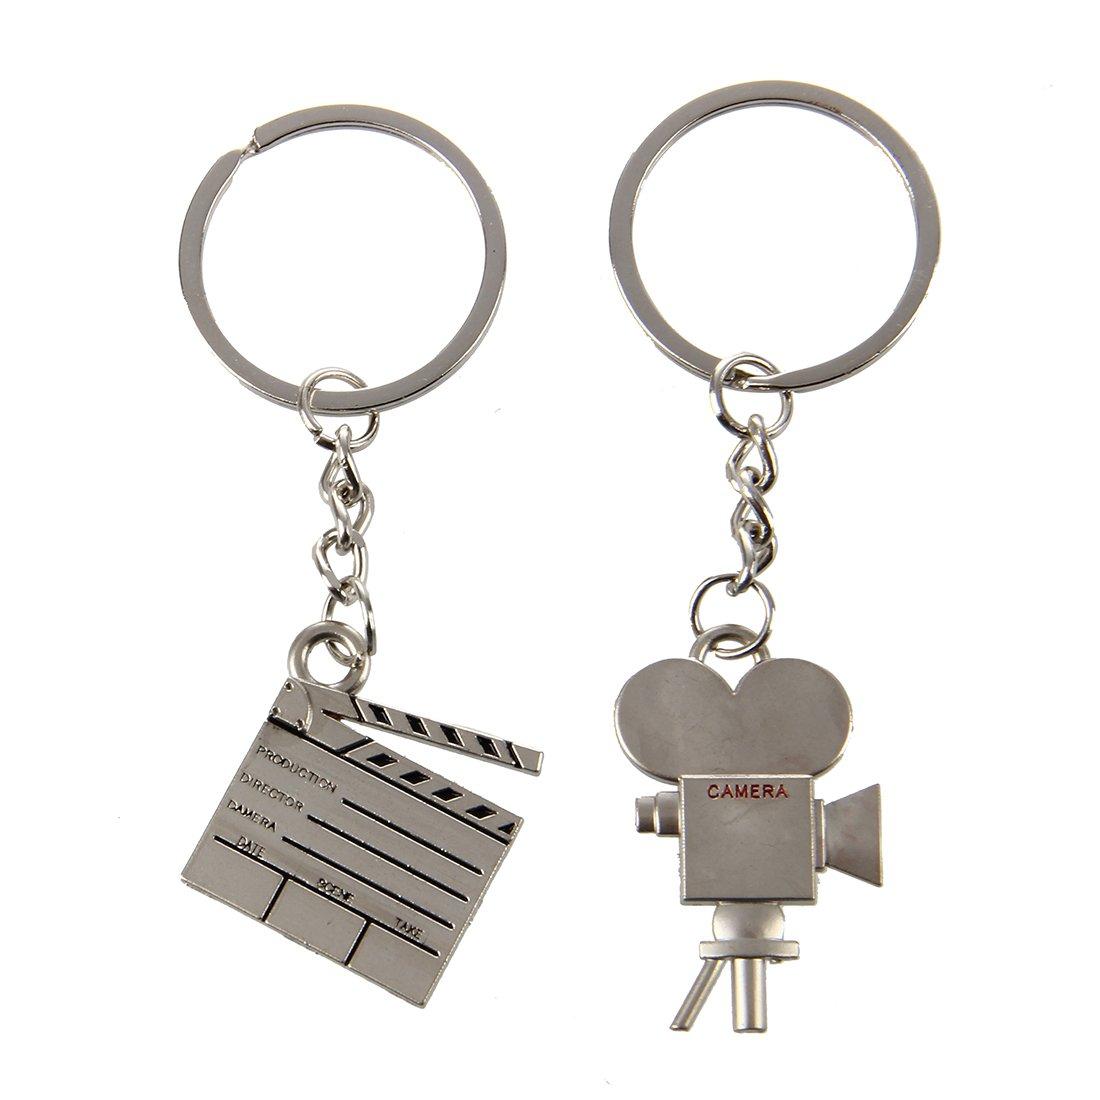 SODIAL(R) Silver Tone 2 Pcs Film Clipboard Camera Key Chain Ring